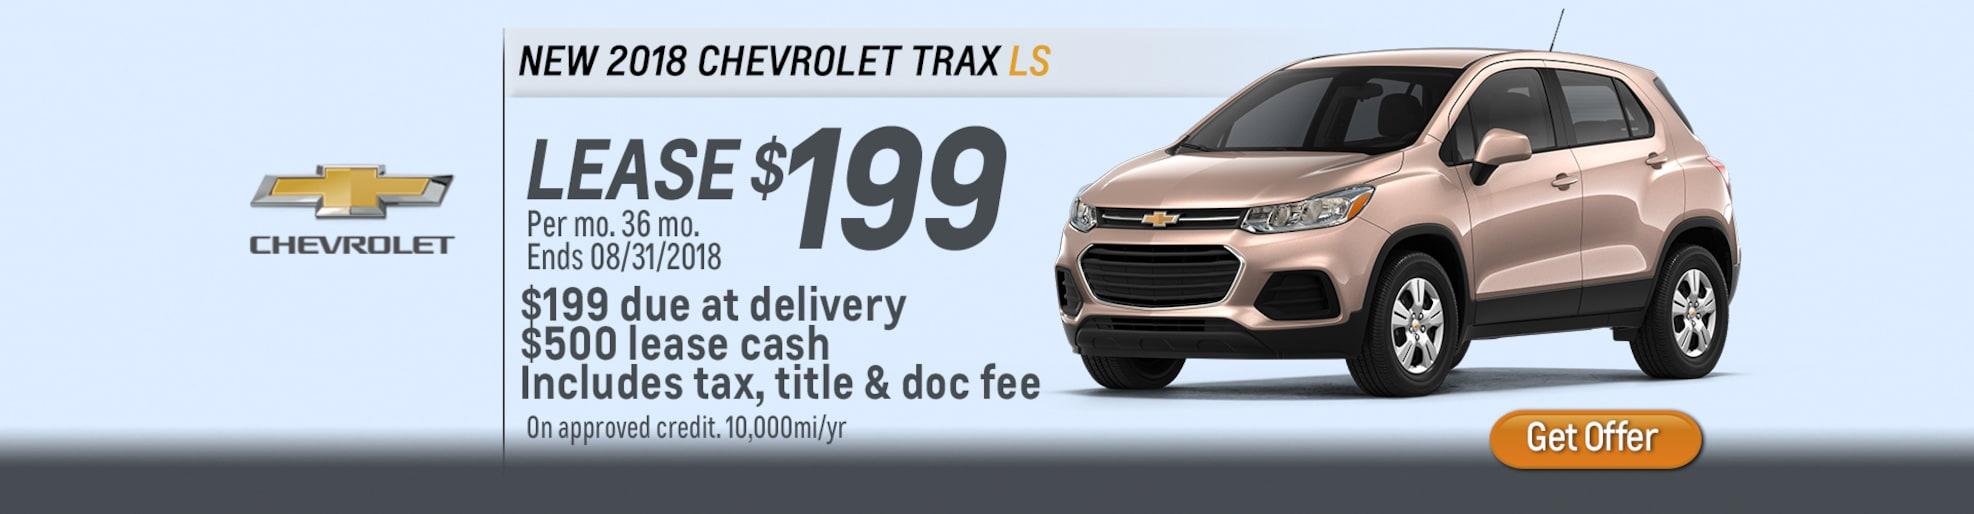 Jeff Wyler Eastgate >> Jeff Wyler Chevrolet Dealerships | New and Used Chevrolet ...